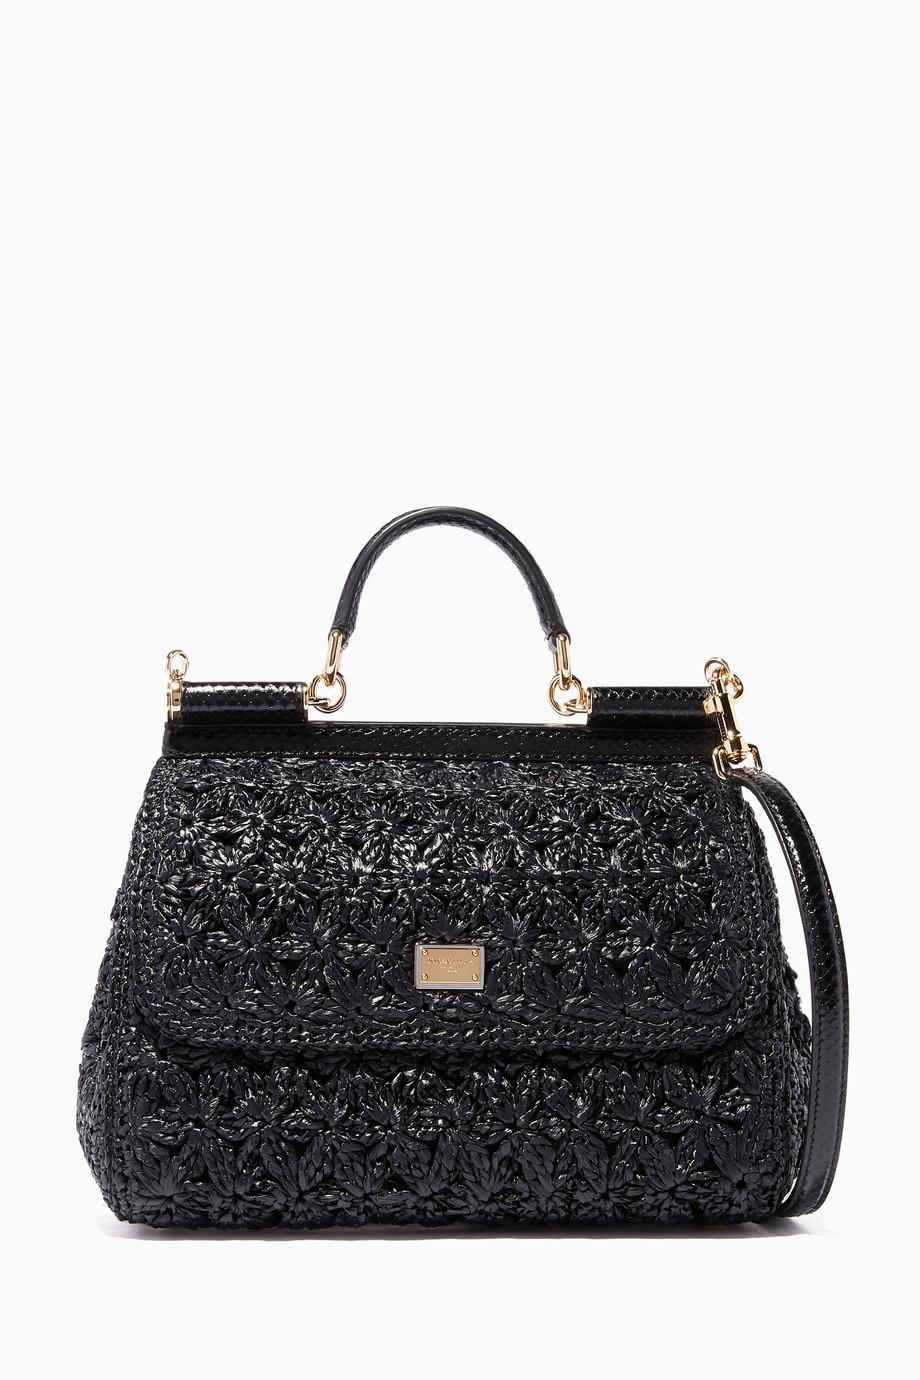 70ac4a95de Shop Dolce & Gabbana Black Medium Sicily Top Handle Bag for Women ...